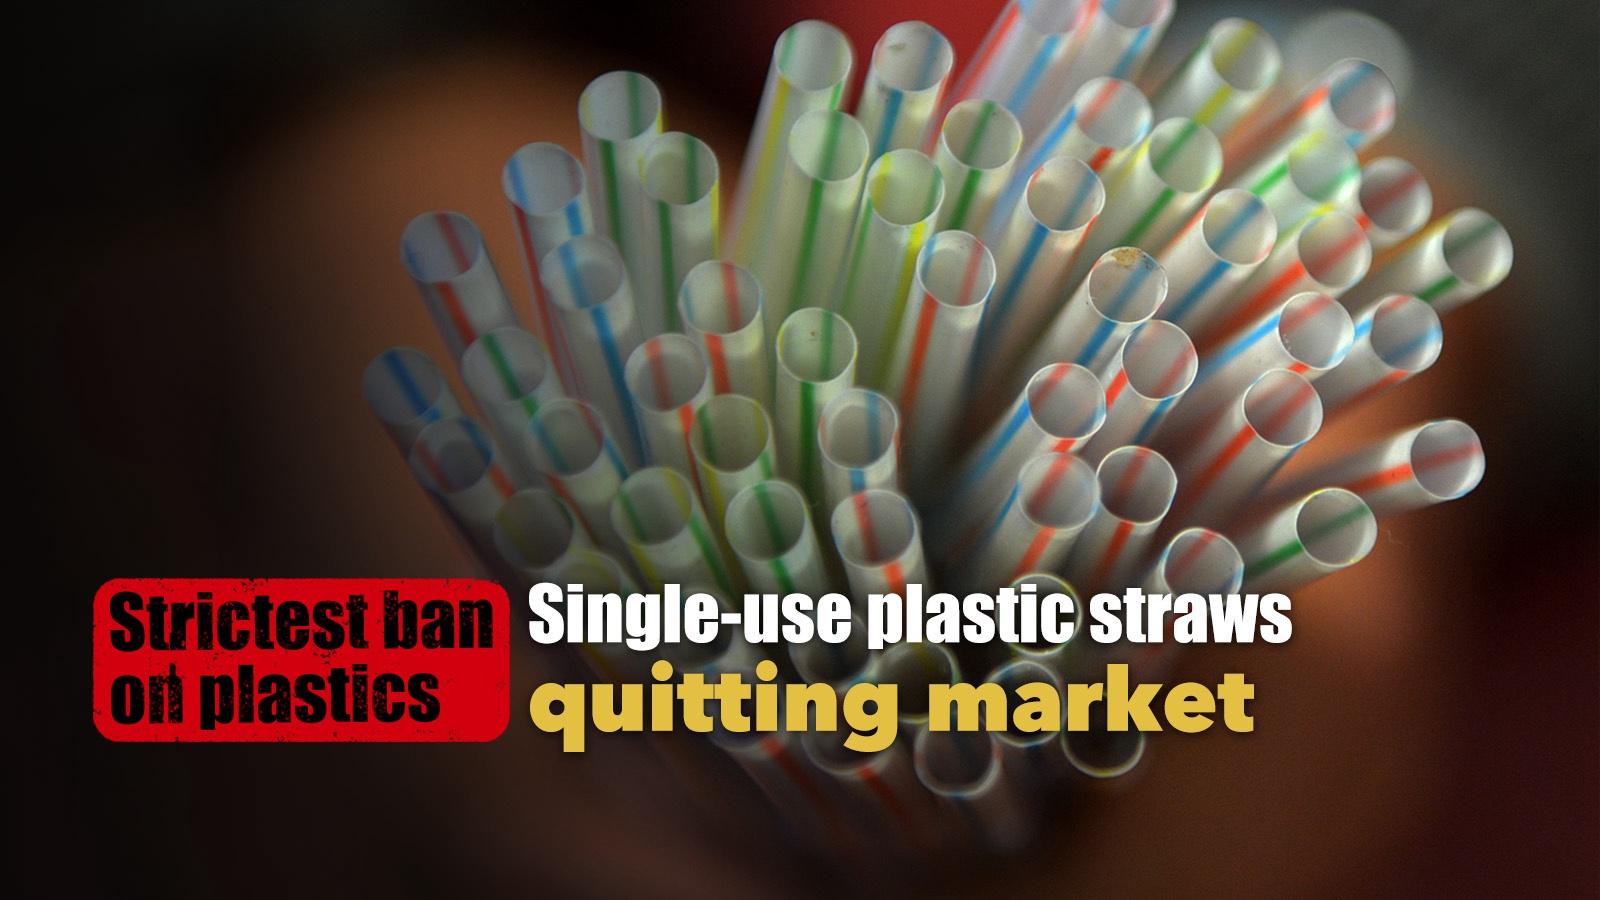 Plastic straws vanish from China as ban kicks in